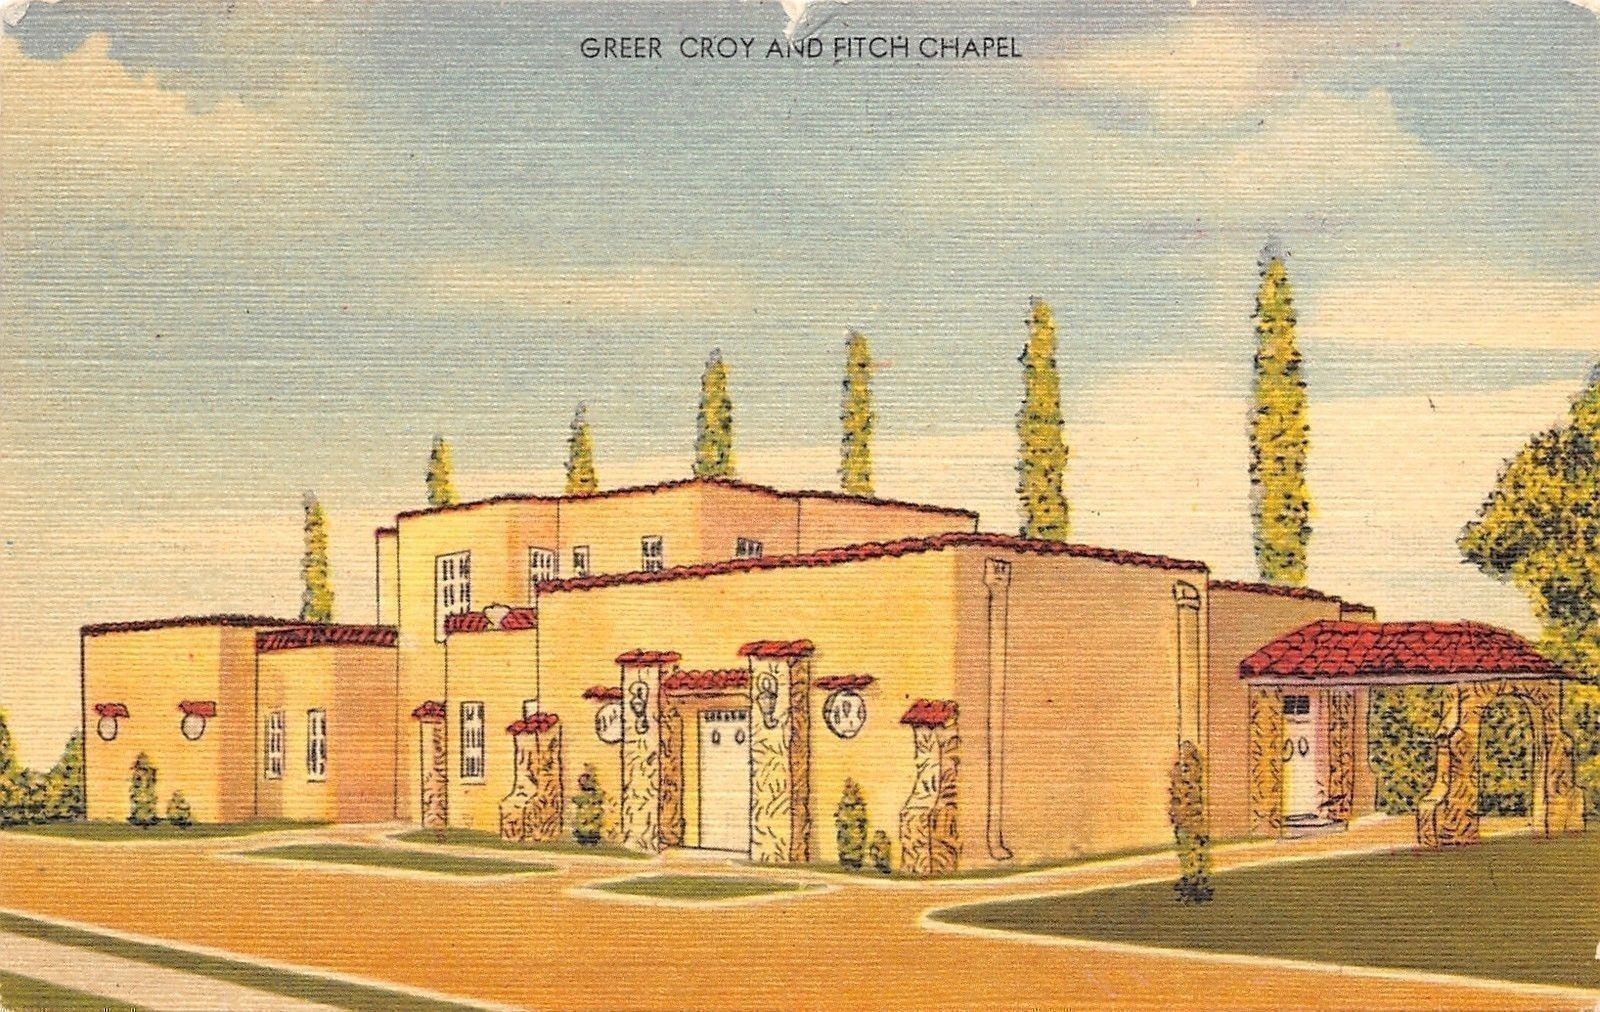 Poplar Bluff Missouri Greer Croy And Finch Funeral Home Chapel 1962